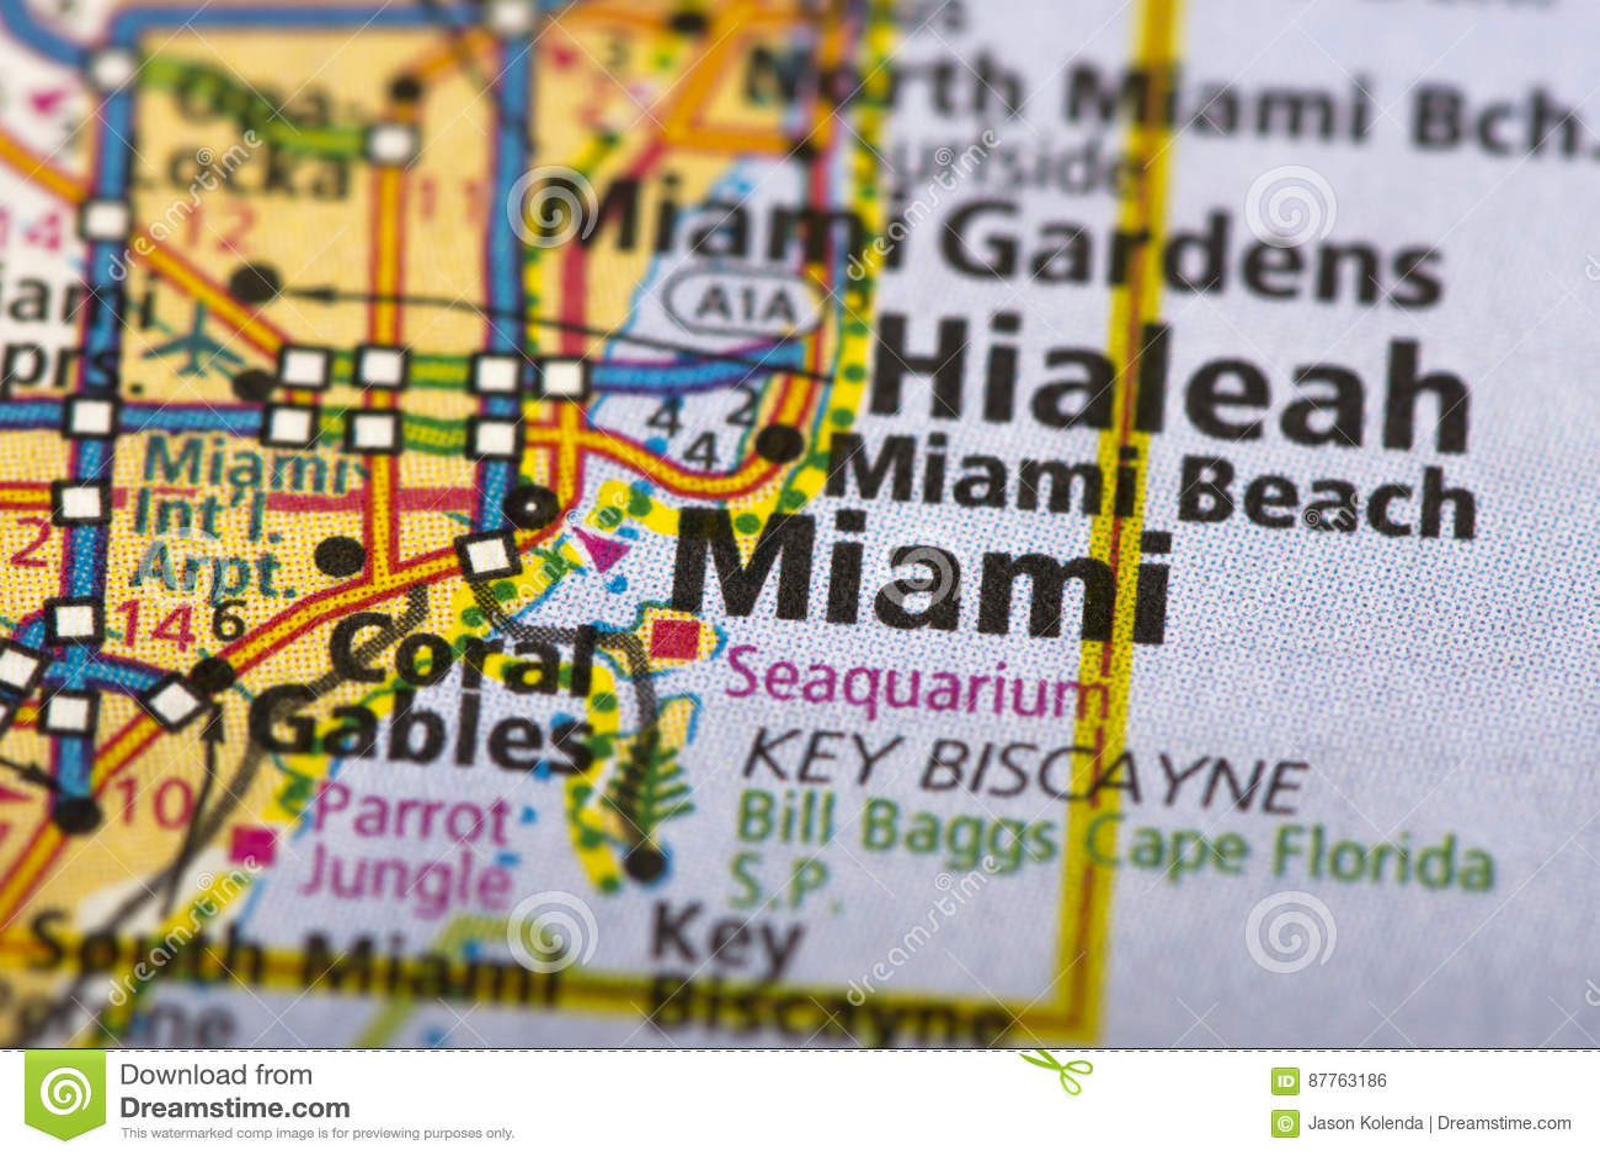 Key United States Map Art on usa map key, louisiana map key, liberia map key, sudan map key, belgium map key, missouri map key, sandpoint map key, americas map key, indiana map key, sierra leone map key, zambia map key, paris map key, florida map key, animal map key, bermuda map key, delaware map key, austria map key, slovakia map key, mexico map key, north carolina map key,